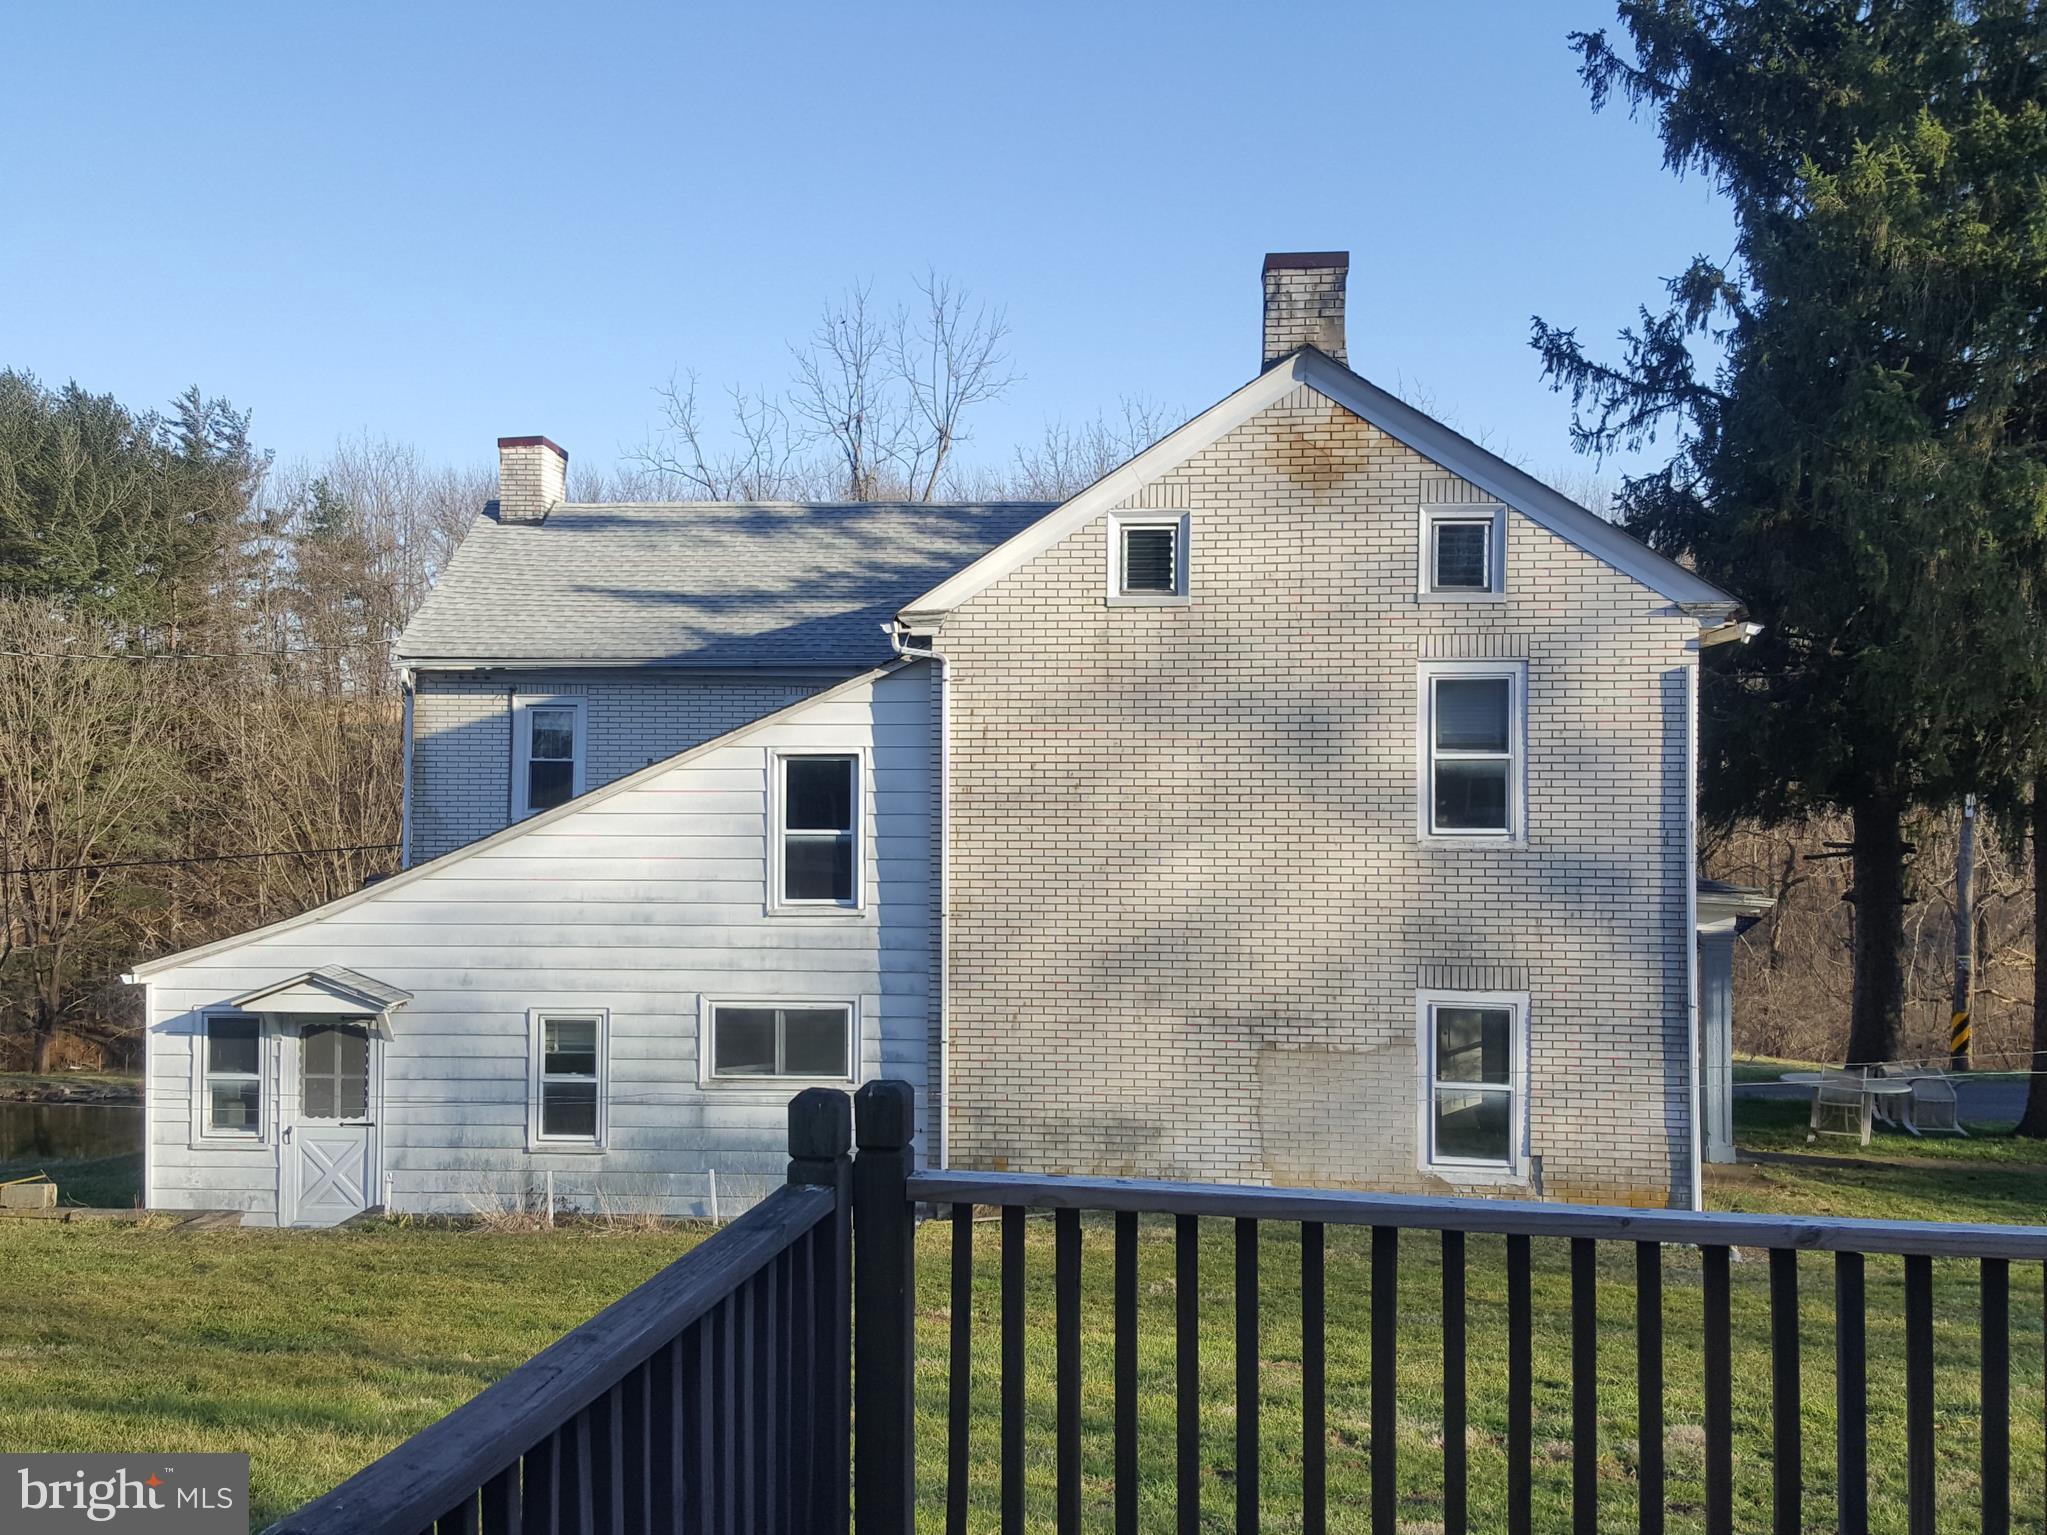 171 DURHAM NOX ROAD, KINTNERSVILLE, PA 18930